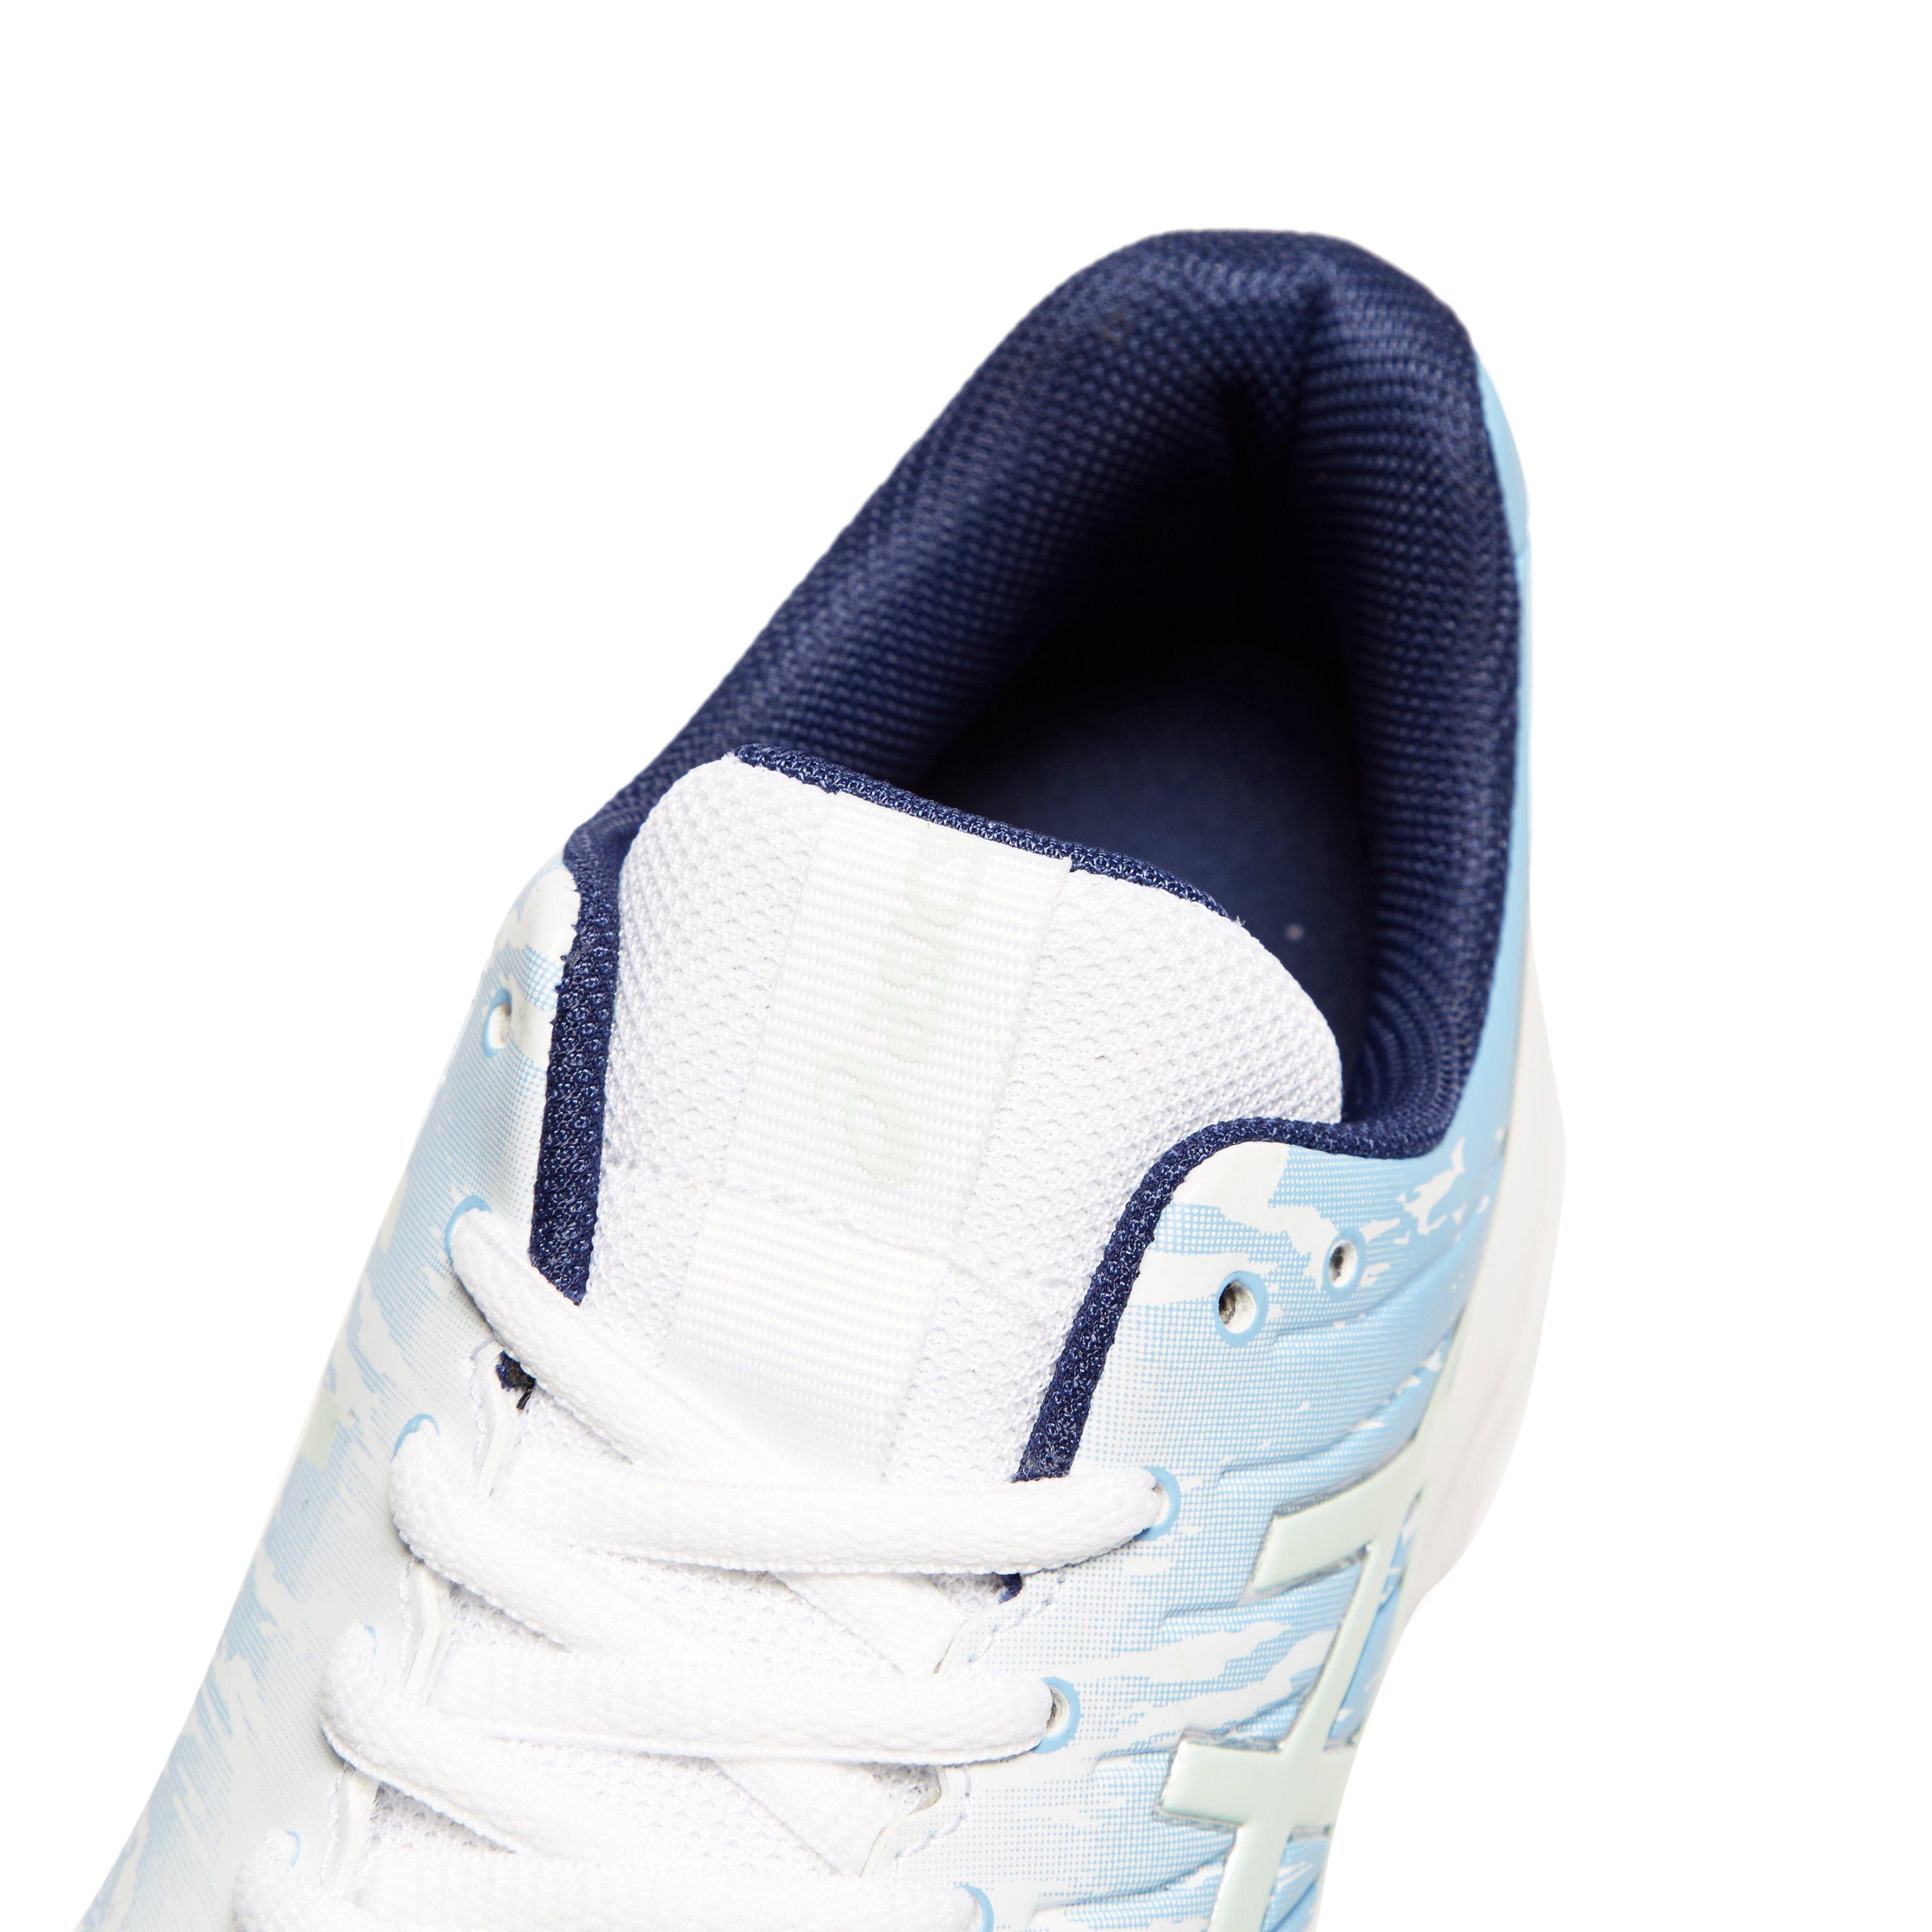 ASICS Gel-Blackheath 7 Women's Hockey Shoes